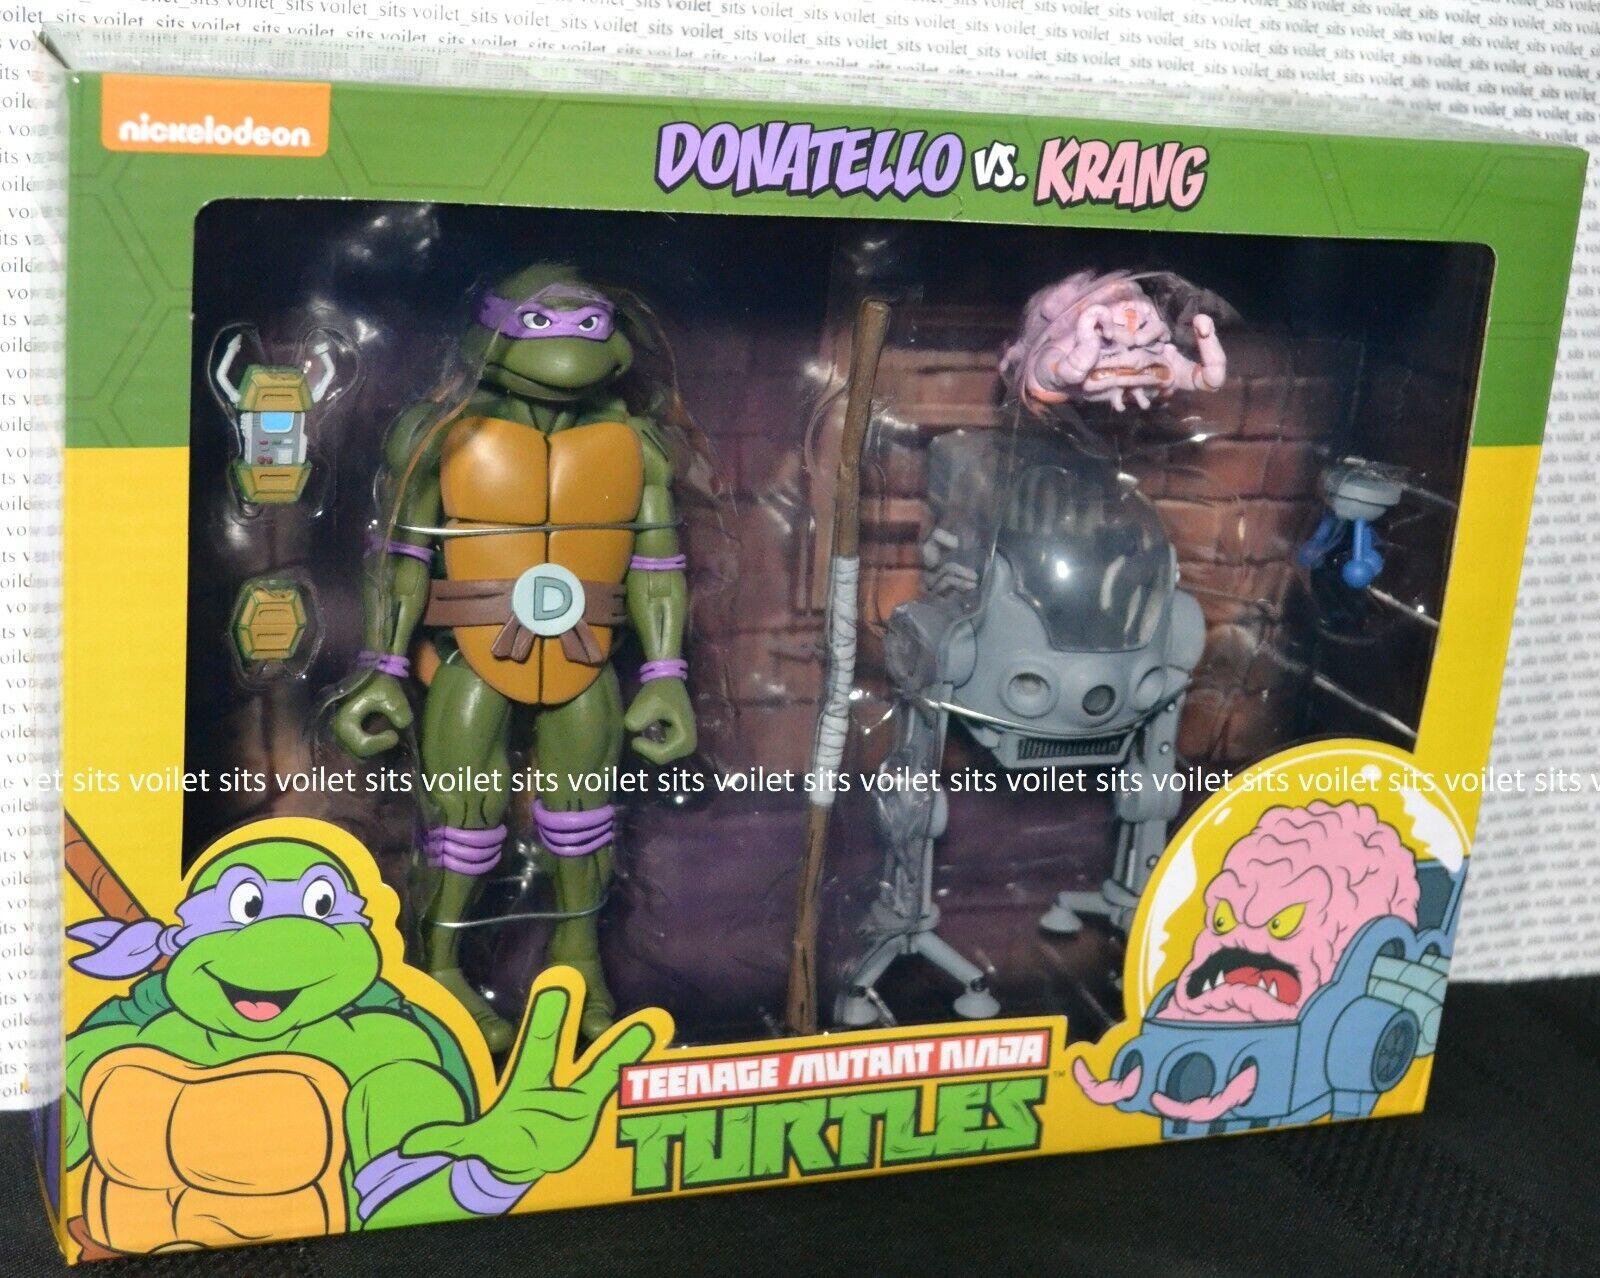 NECA TMNT Teenage Mutant Ninja Turtles Exclusive cifra Donatello contro Krang